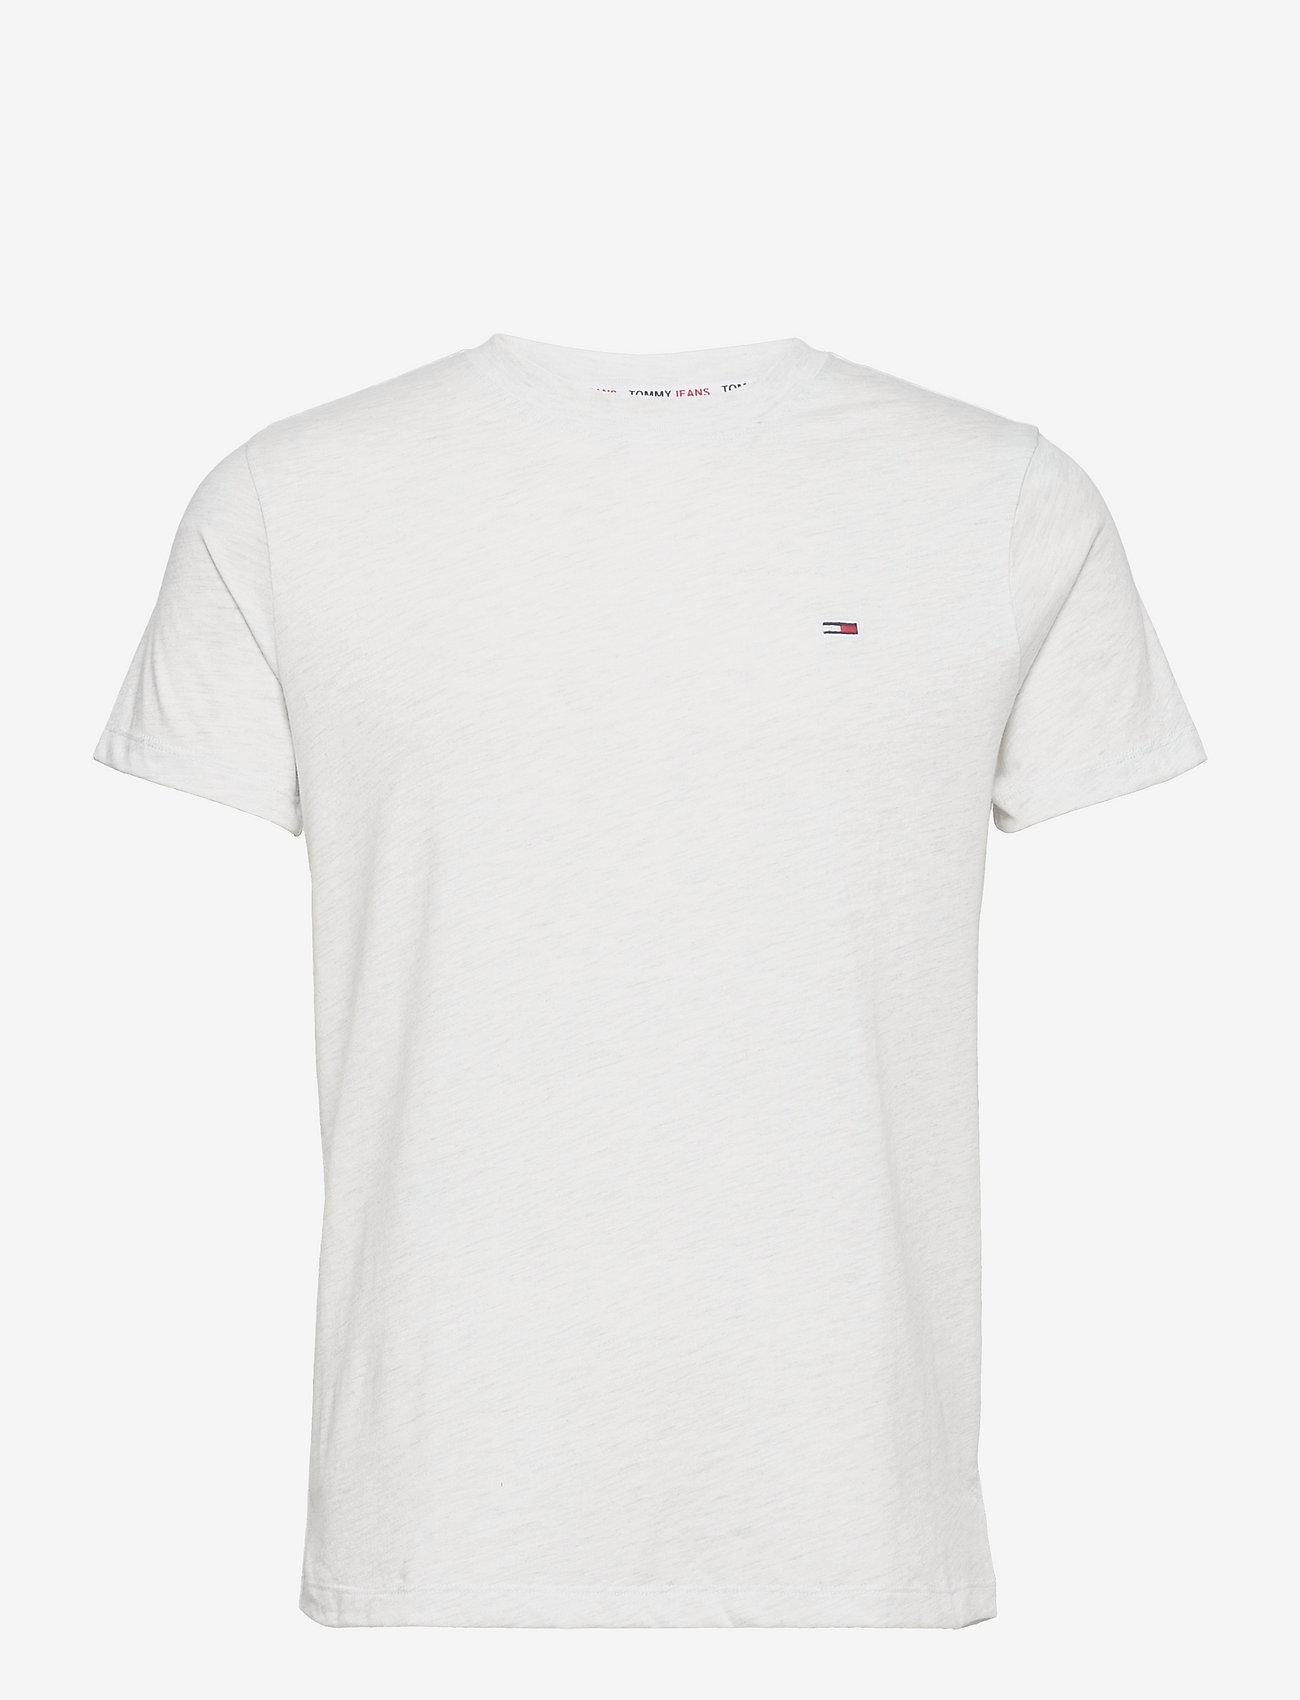 Tommy Jeans - TJM SLIM C NECK TEE - basic t-shirts - white - 0